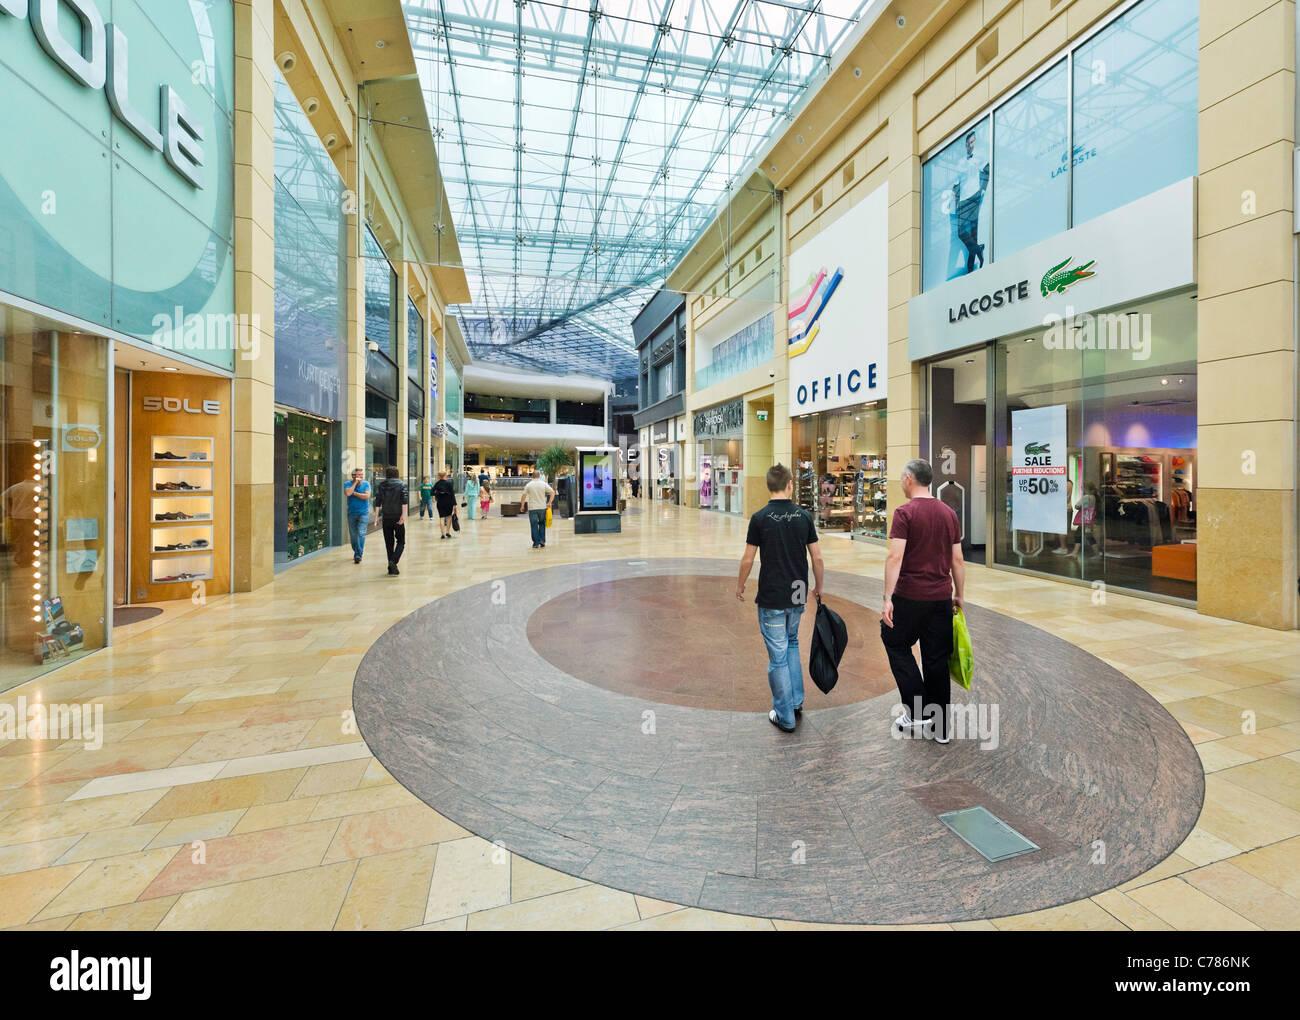 The Bull Ring Shopping Centre, Birmingham, West Midlands, England, UK - Stock Image